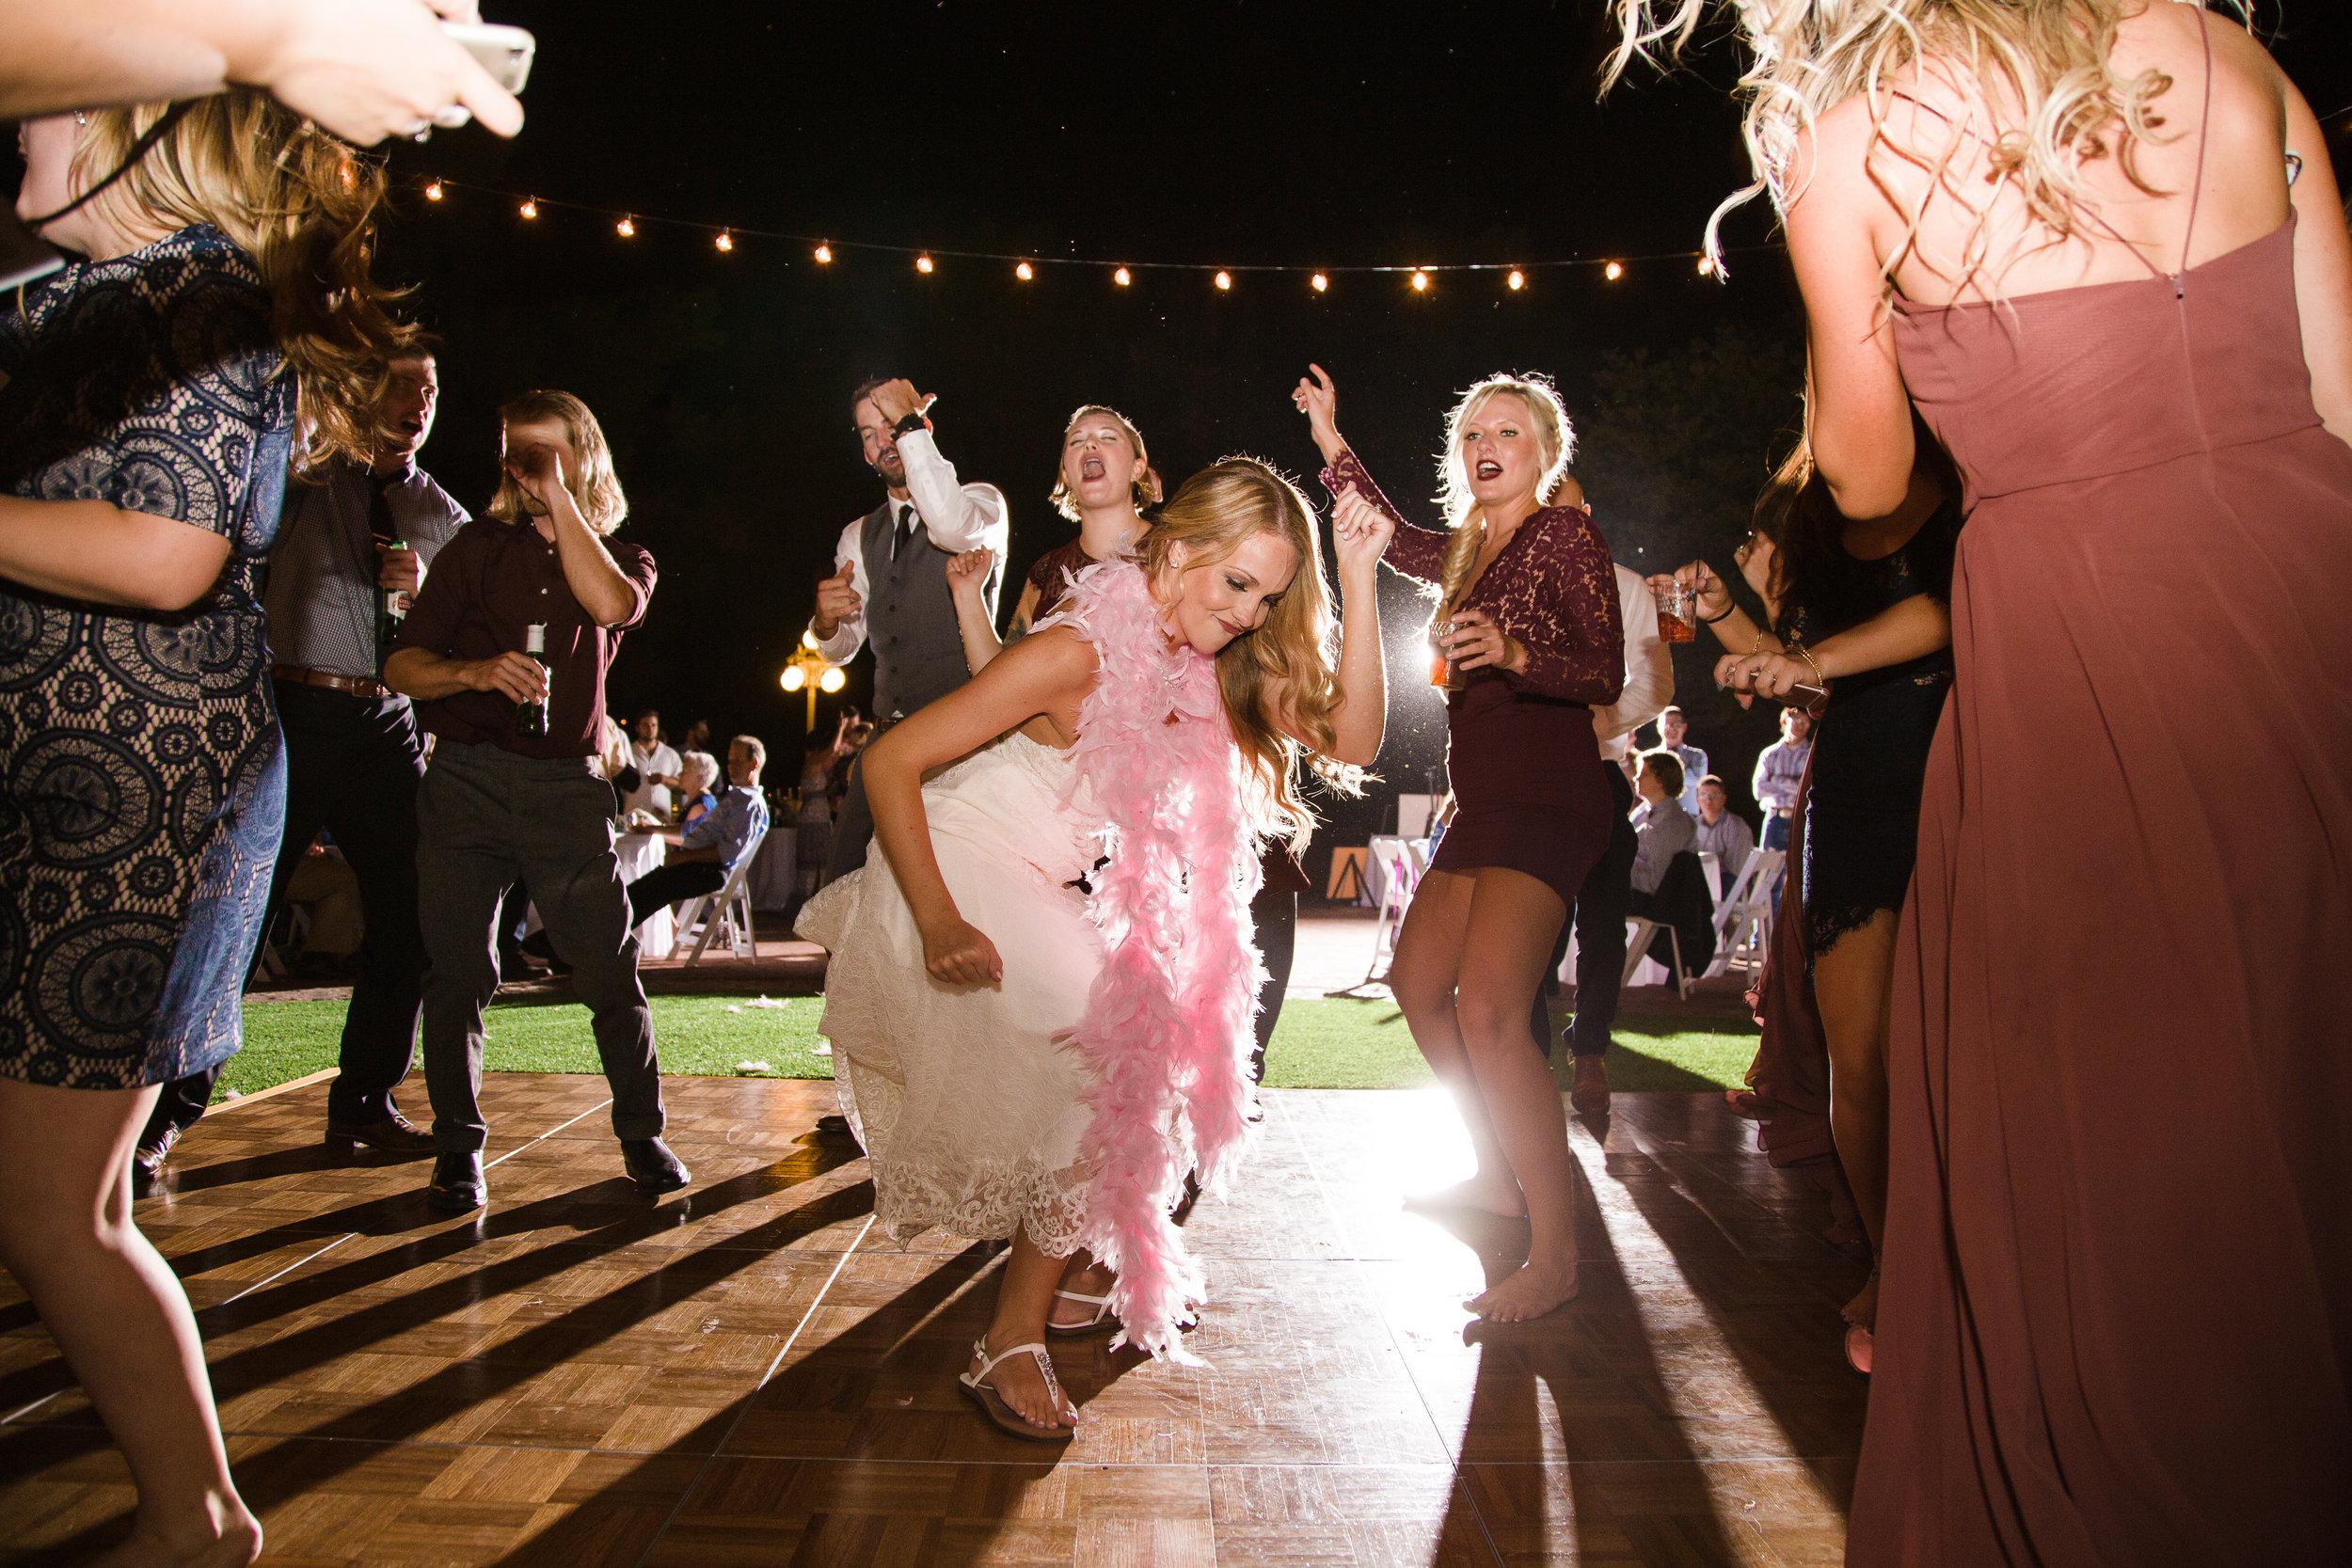 Dance floor madness